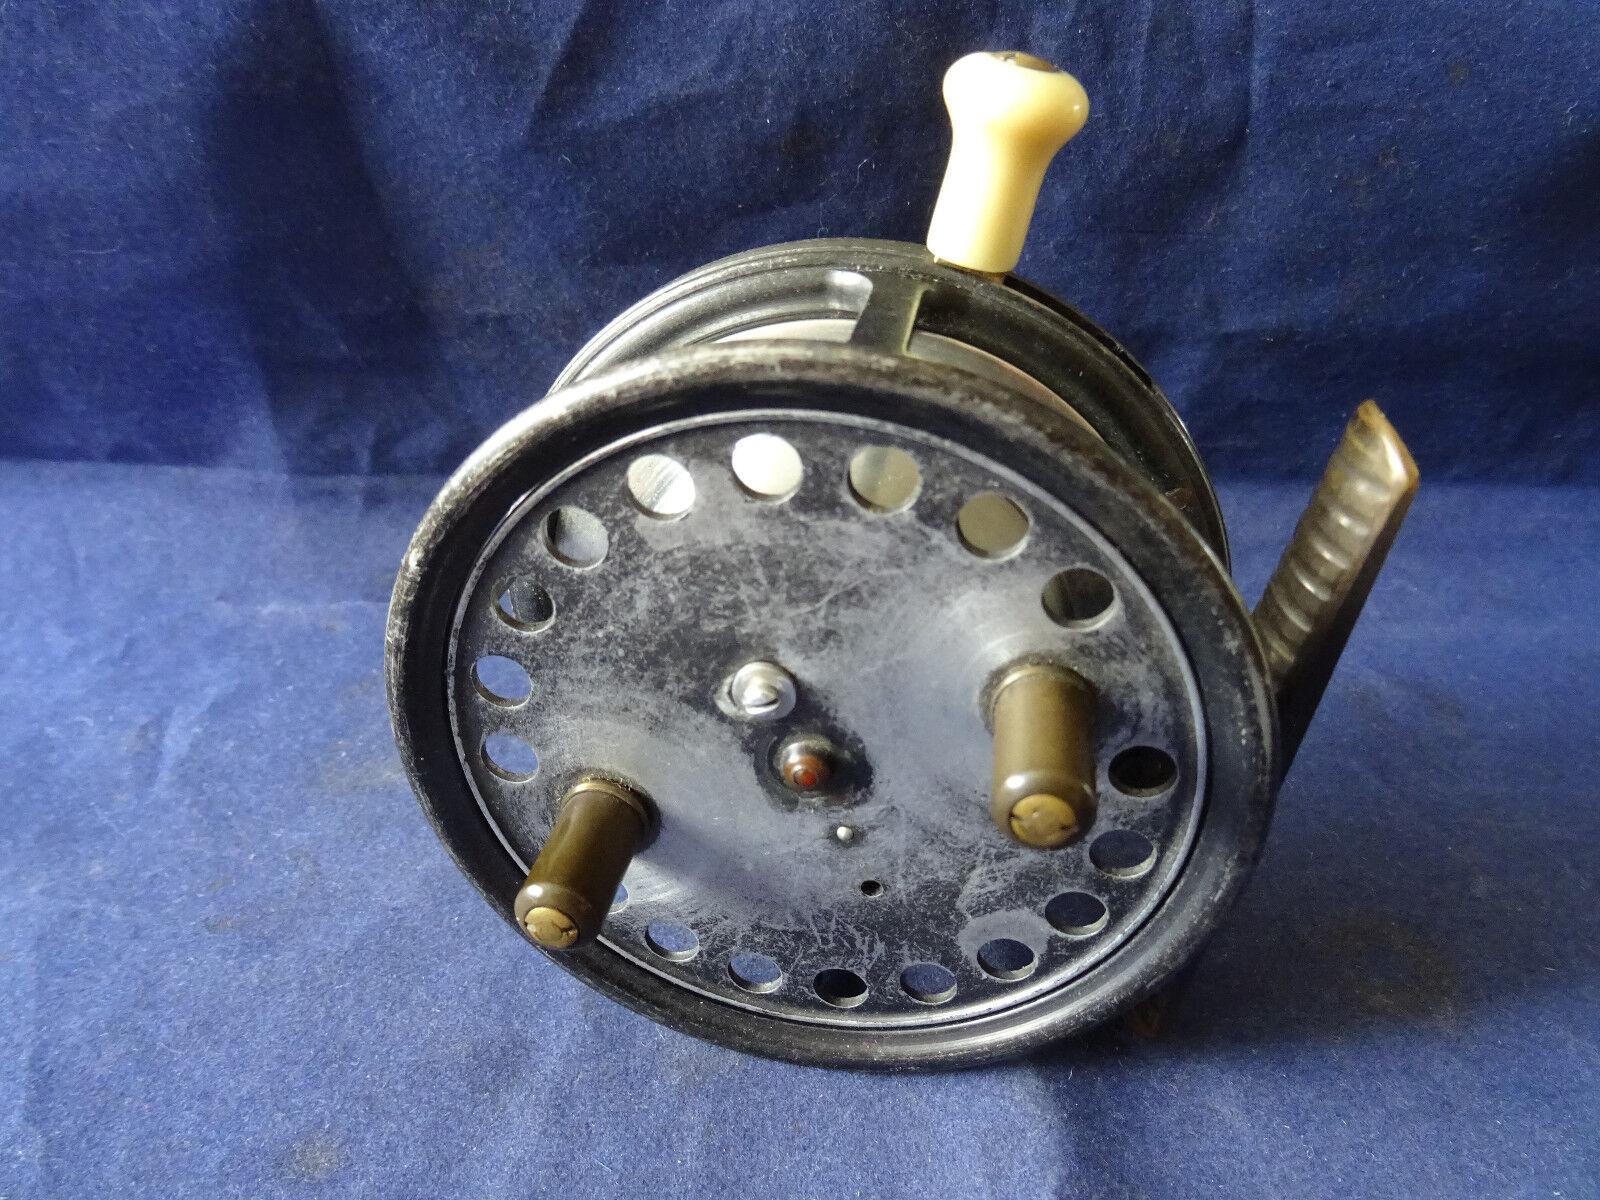 Un ottimo vintage Hardy SILEX Major 3 12 CASTING Centrepin SPINNING REEL